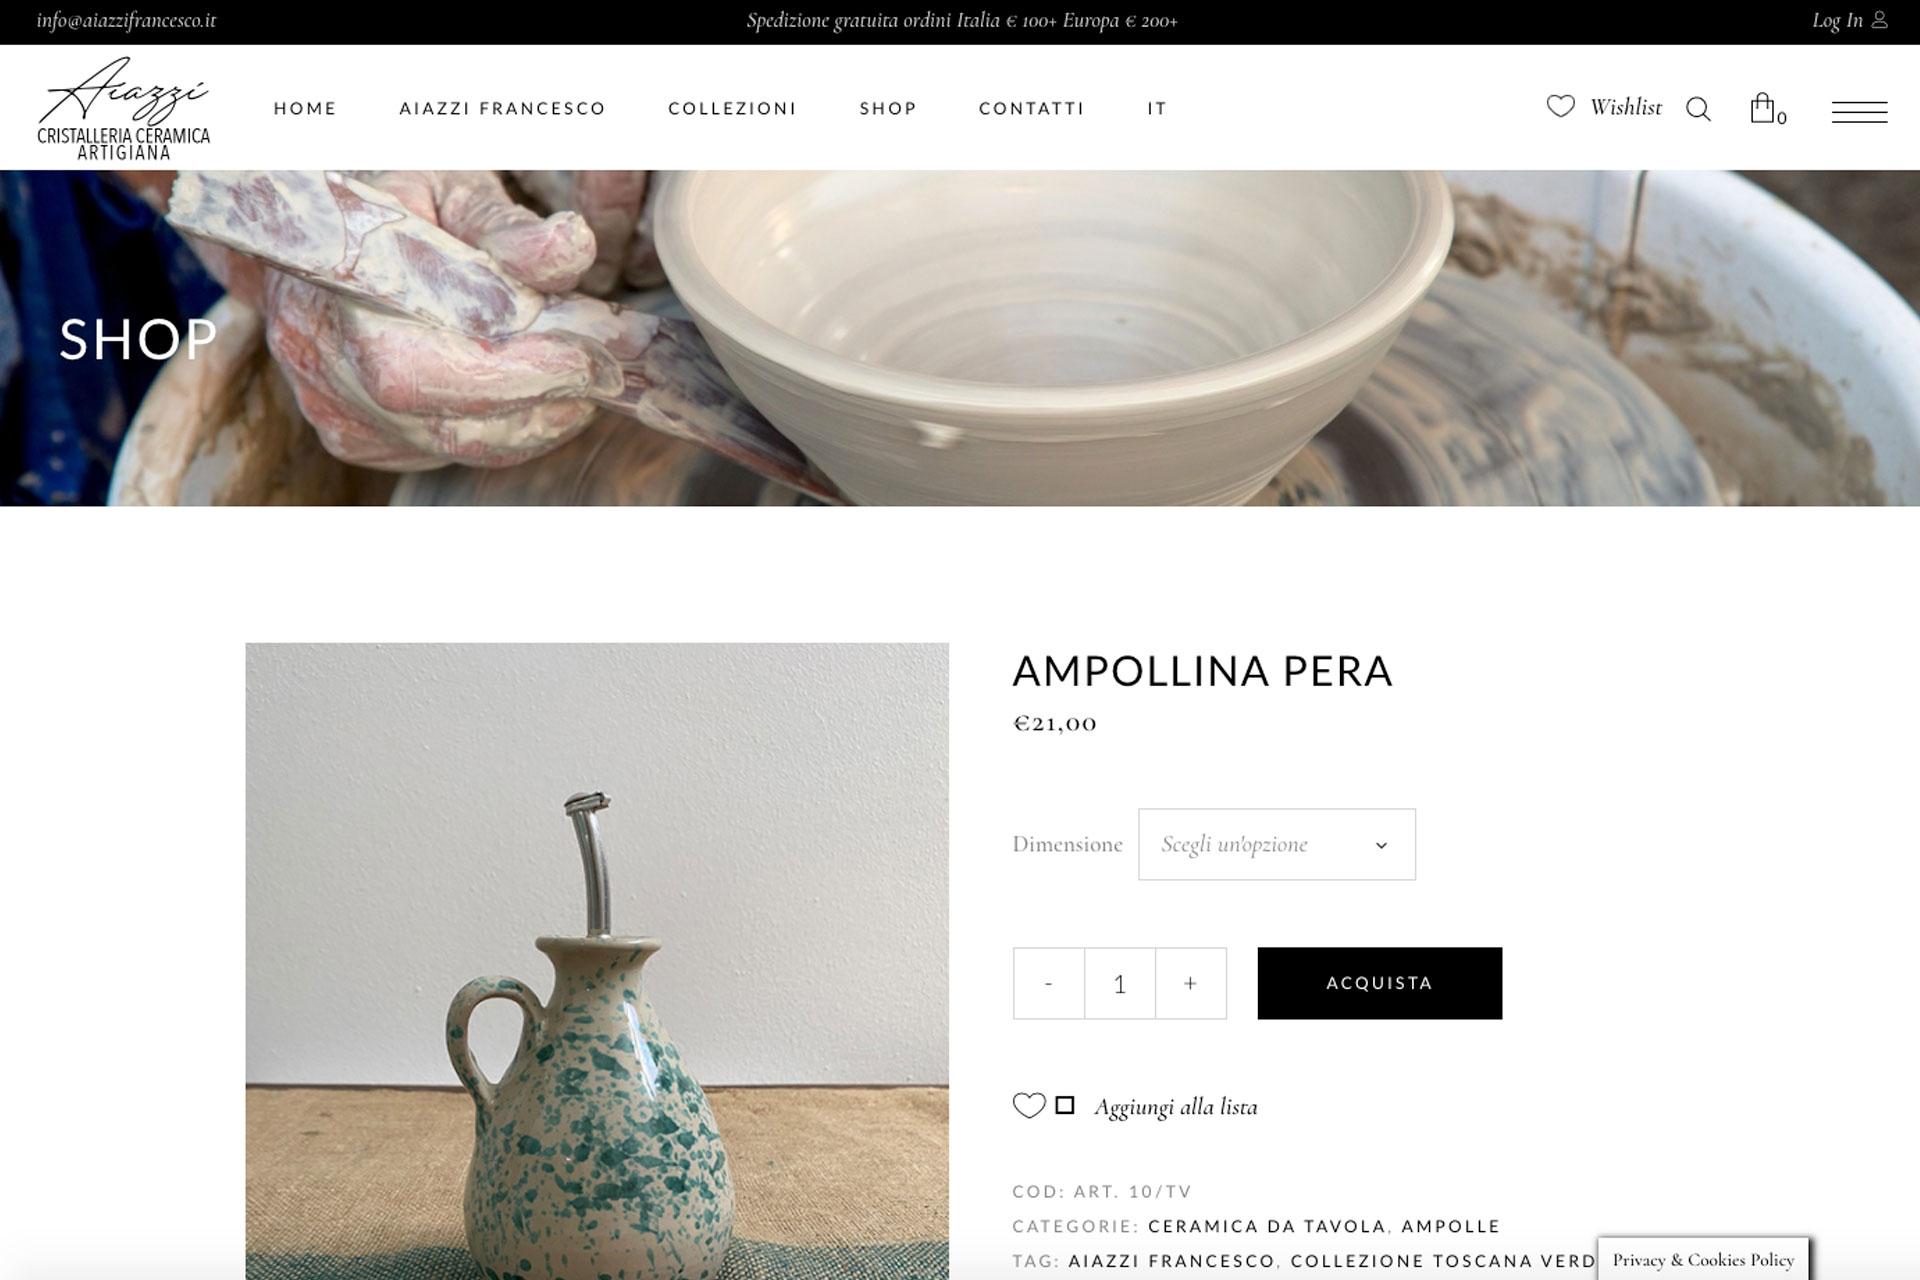 aiazzi-francesco-e-commerce-4